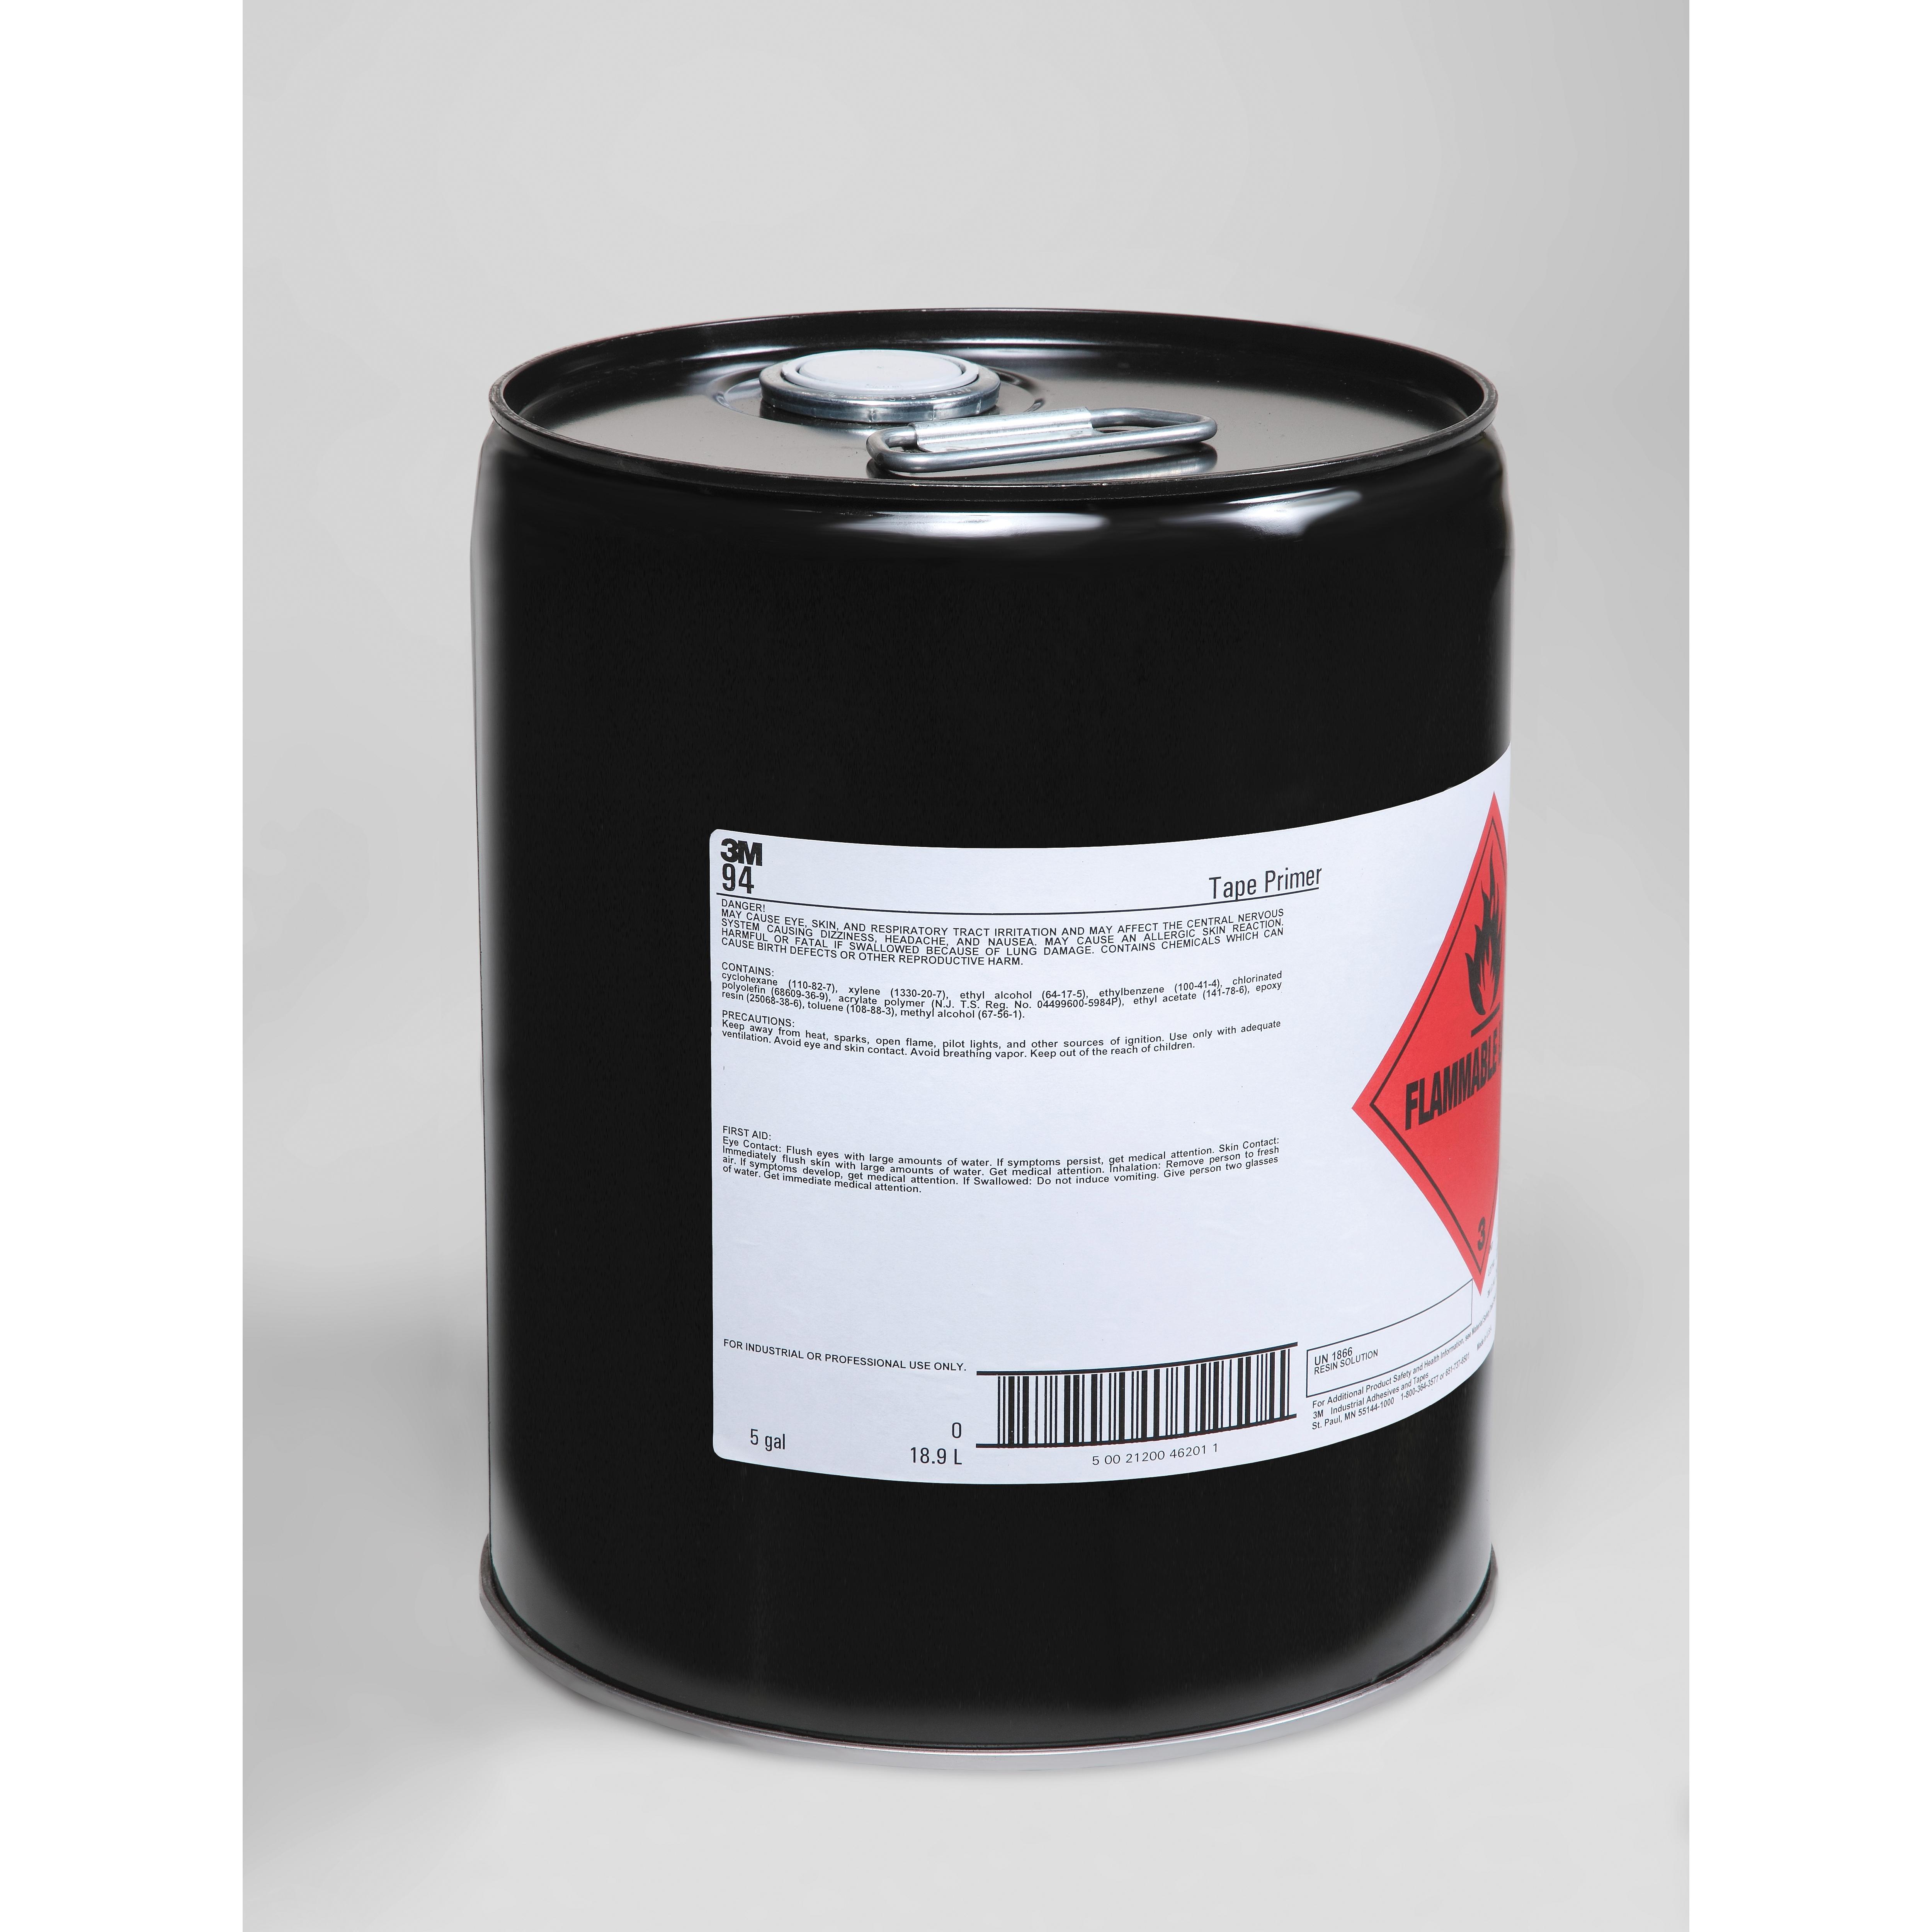 3M™ 021200-46201 94 Tape Primer, 5 gal Pail, Liquid, Clear Light Yellow, 0.82